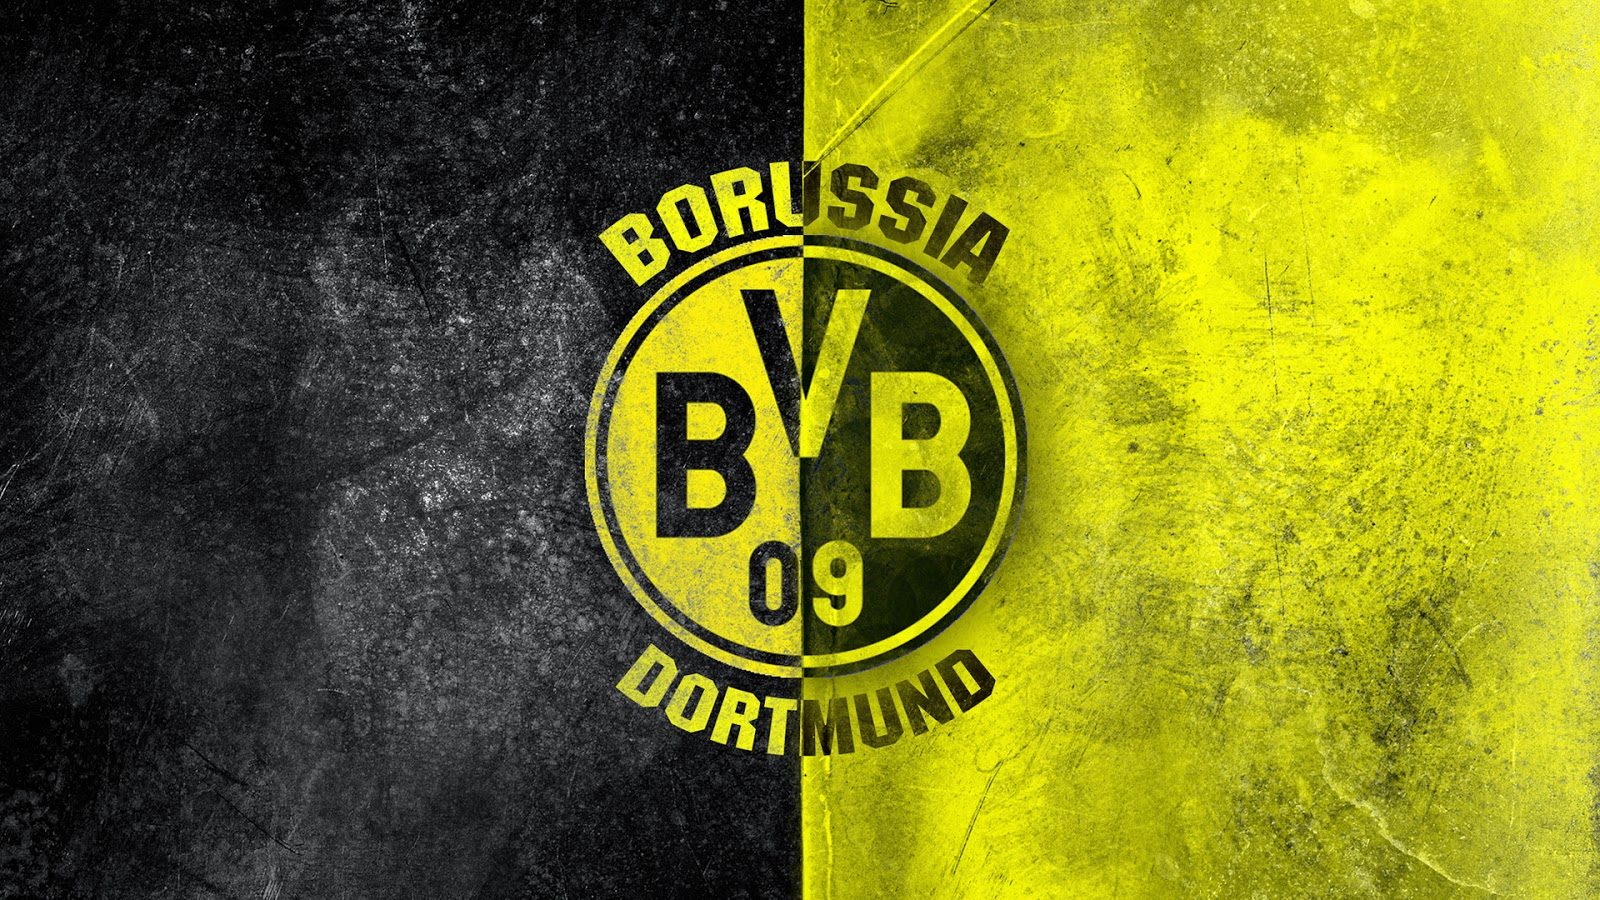 Football Club Logo Hd Wallpapers 2014 2015 Football Wallpapers Hd